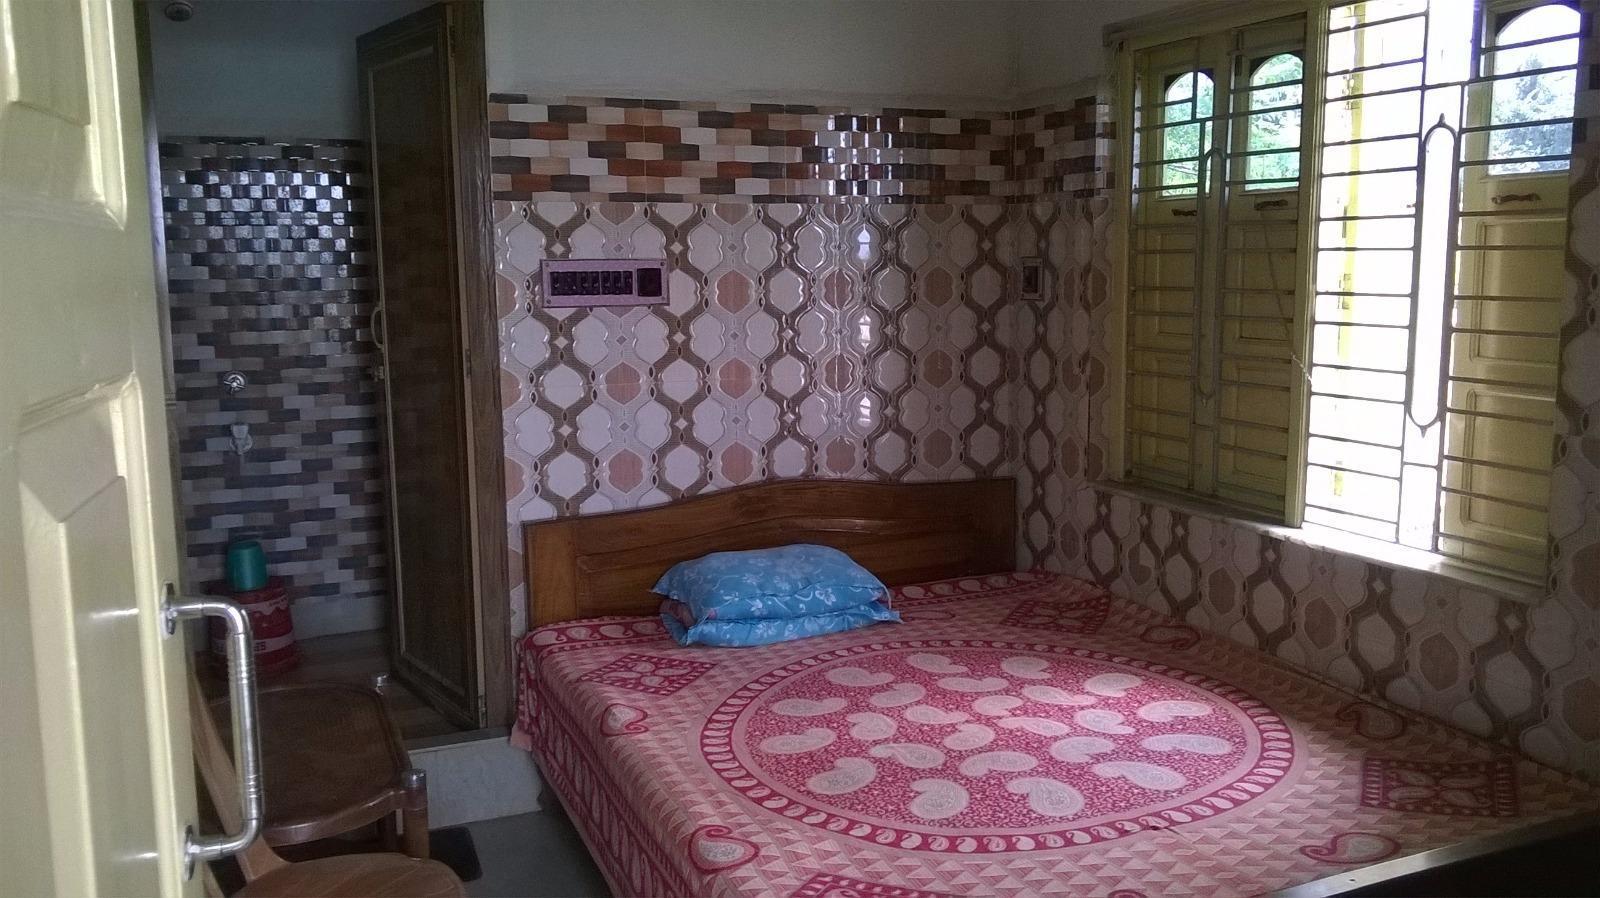 Jagannath Guest House, Mayapur, India - Photos, Room Rates & Promotions